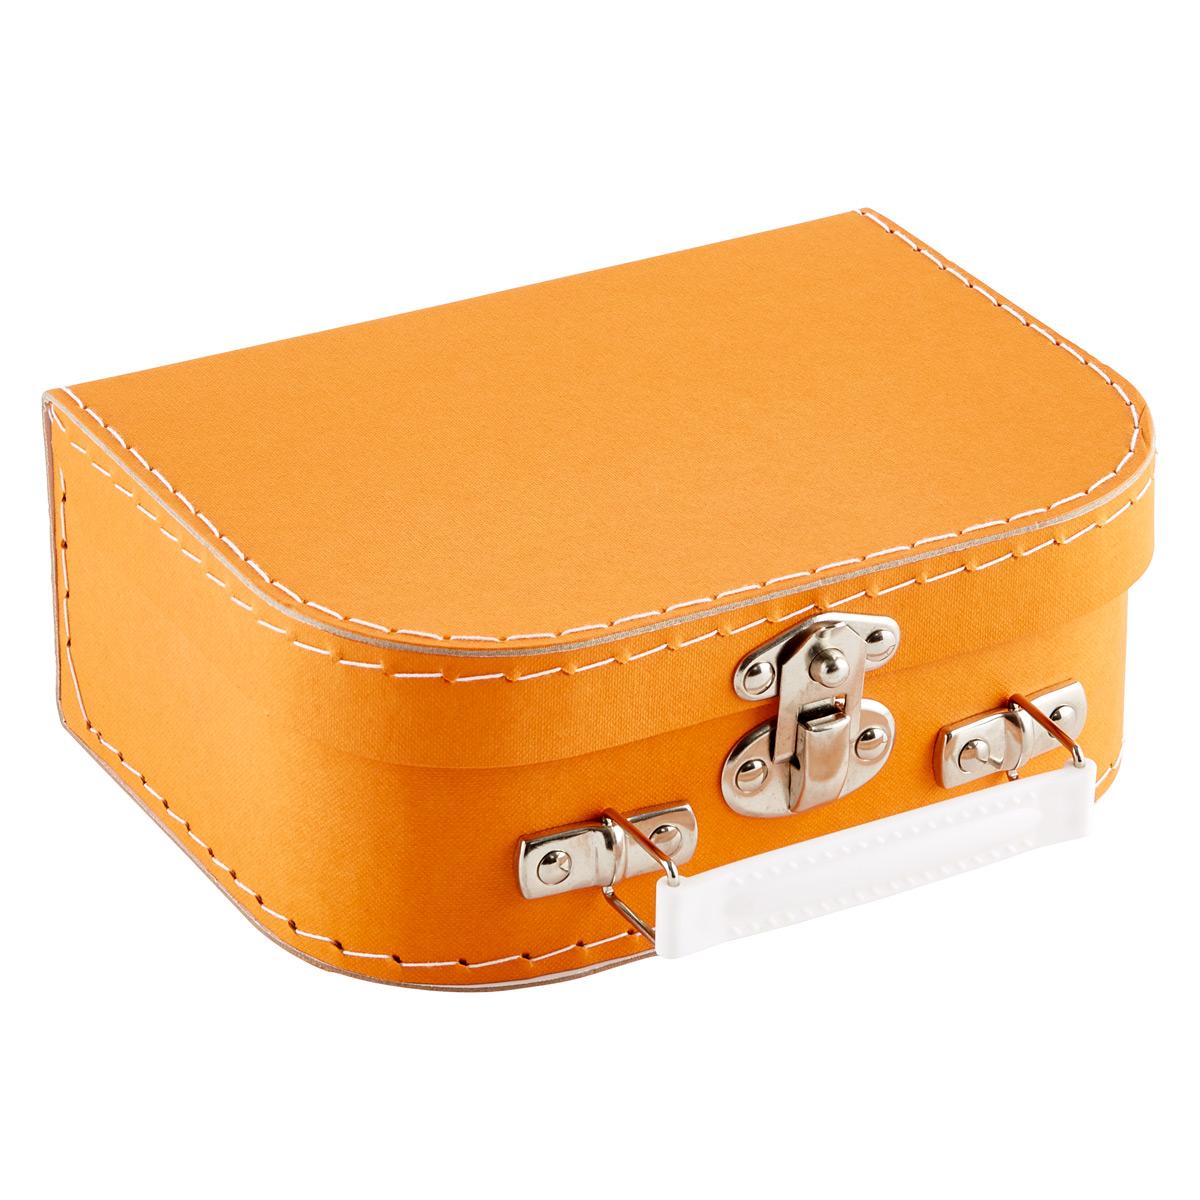 Stockholm Suitcase